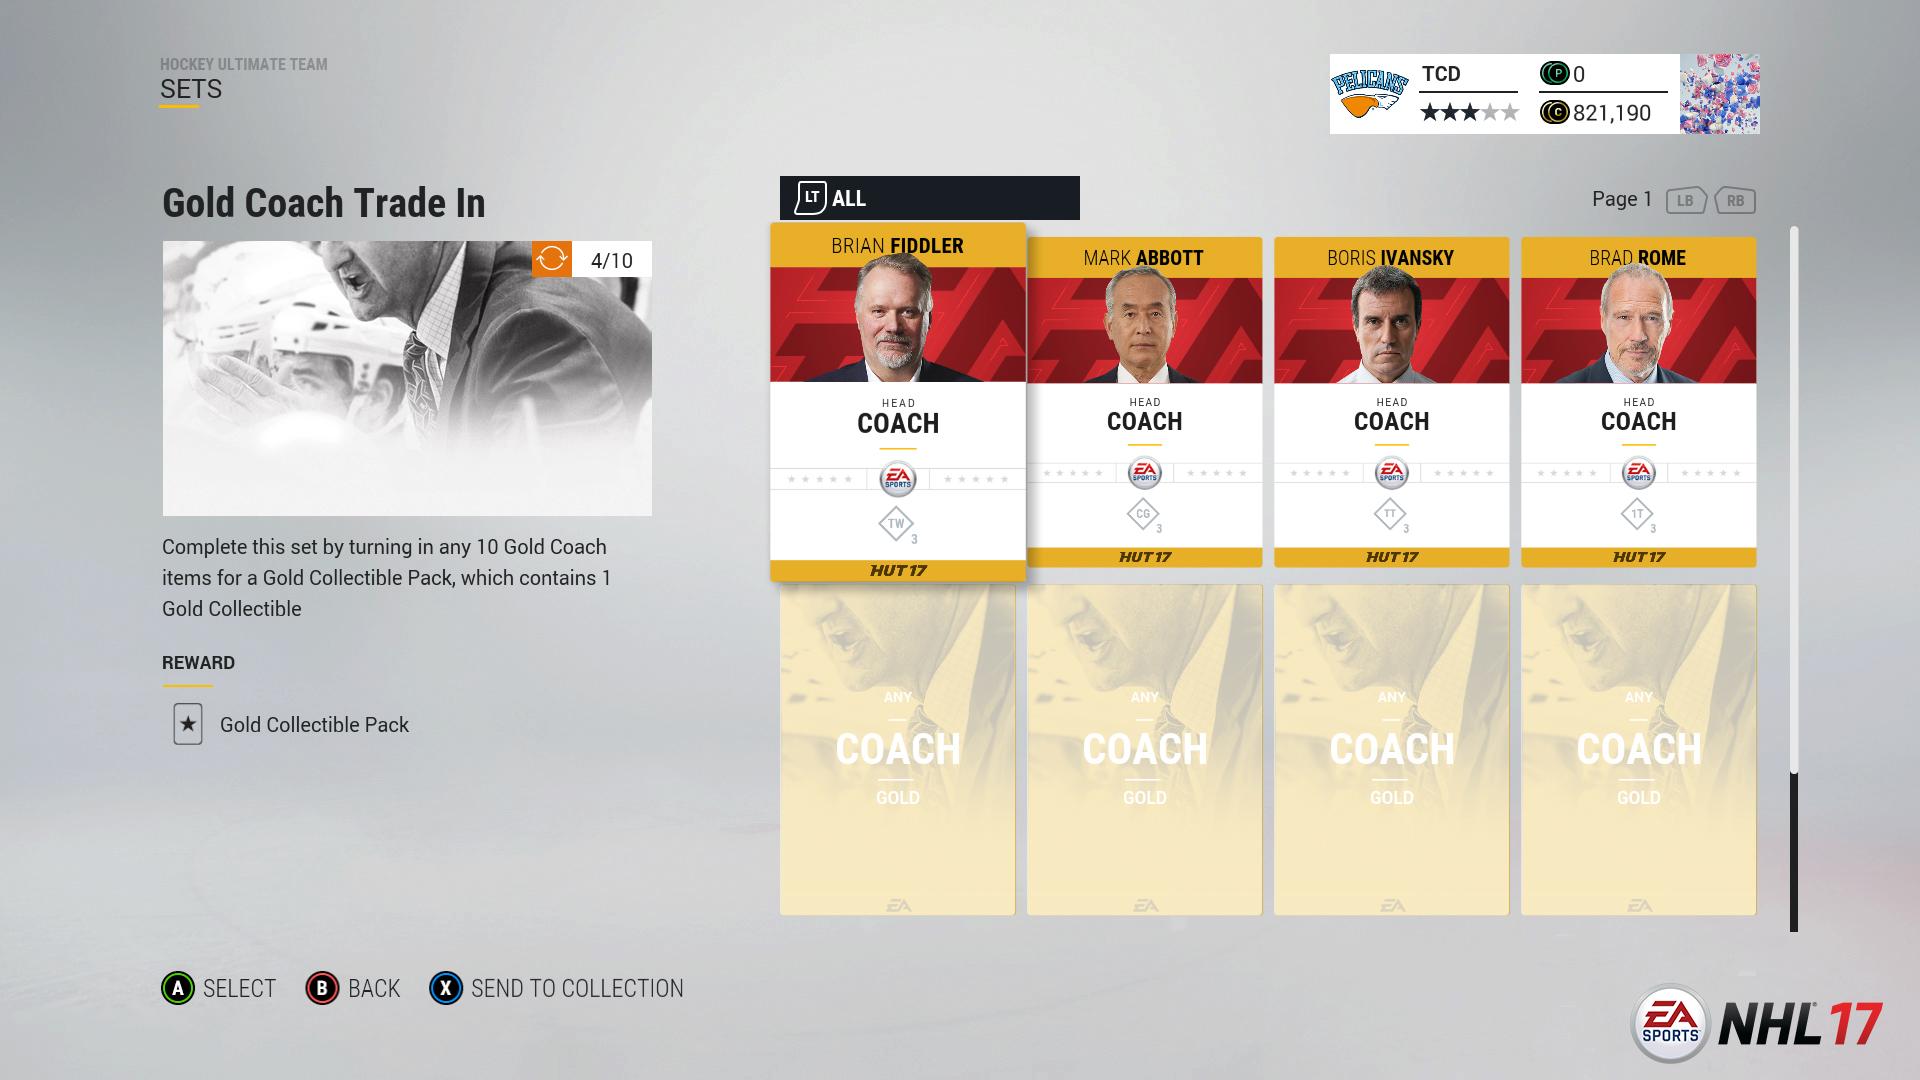 nhl 17 - image 1 - NHL 17 – Hockey Ultimate Team Synergy Trailer